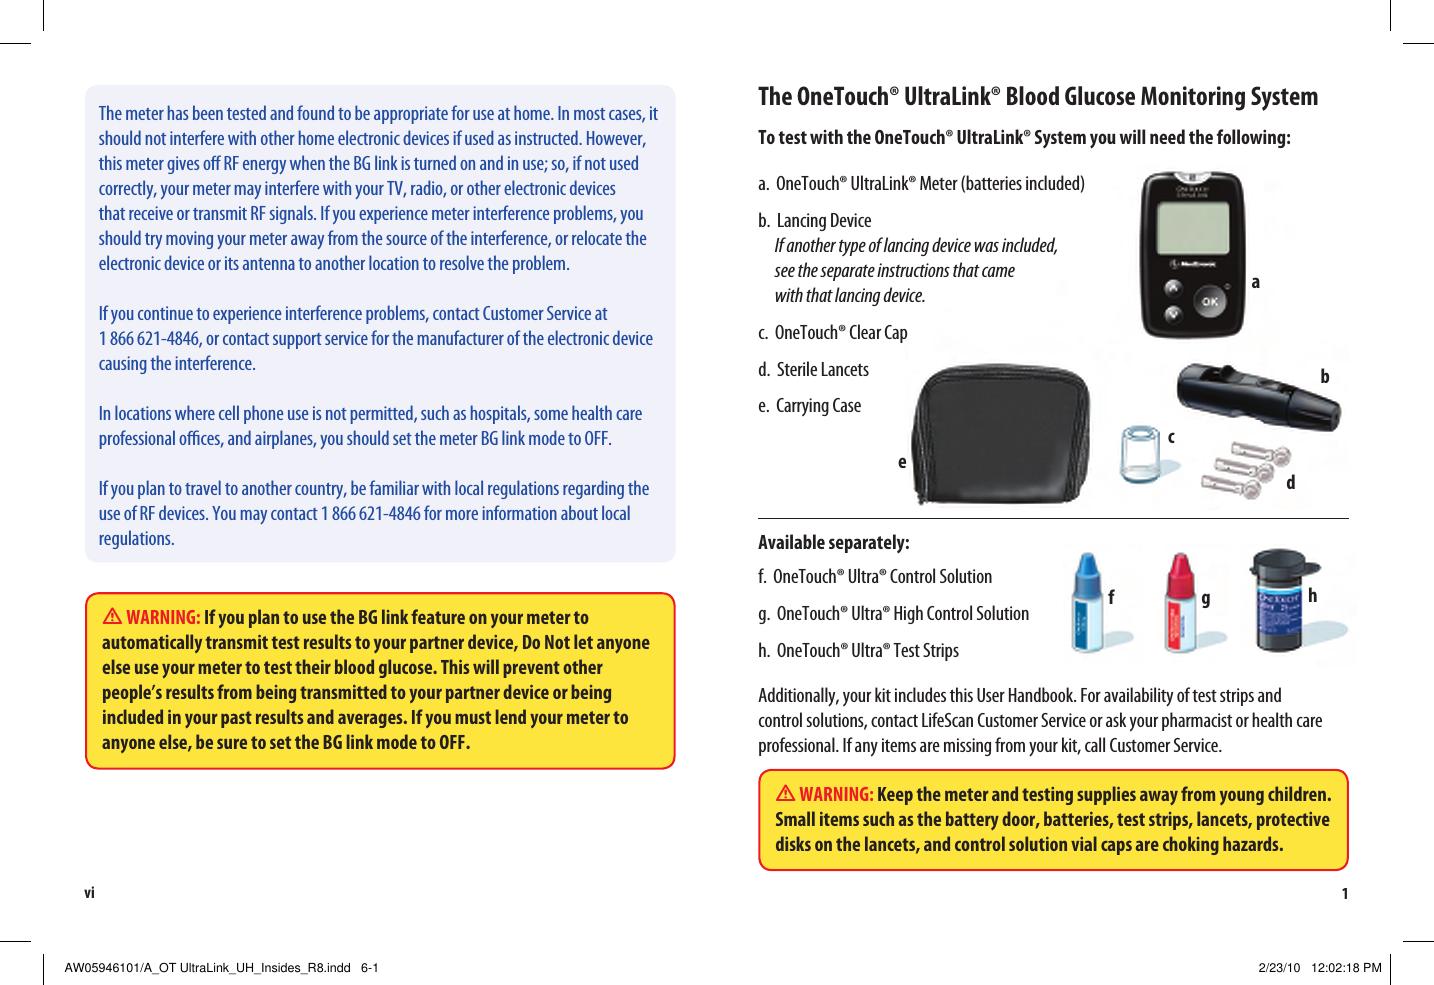 microcommander 91100 manual rh microcommander 91100 manual logoutev de